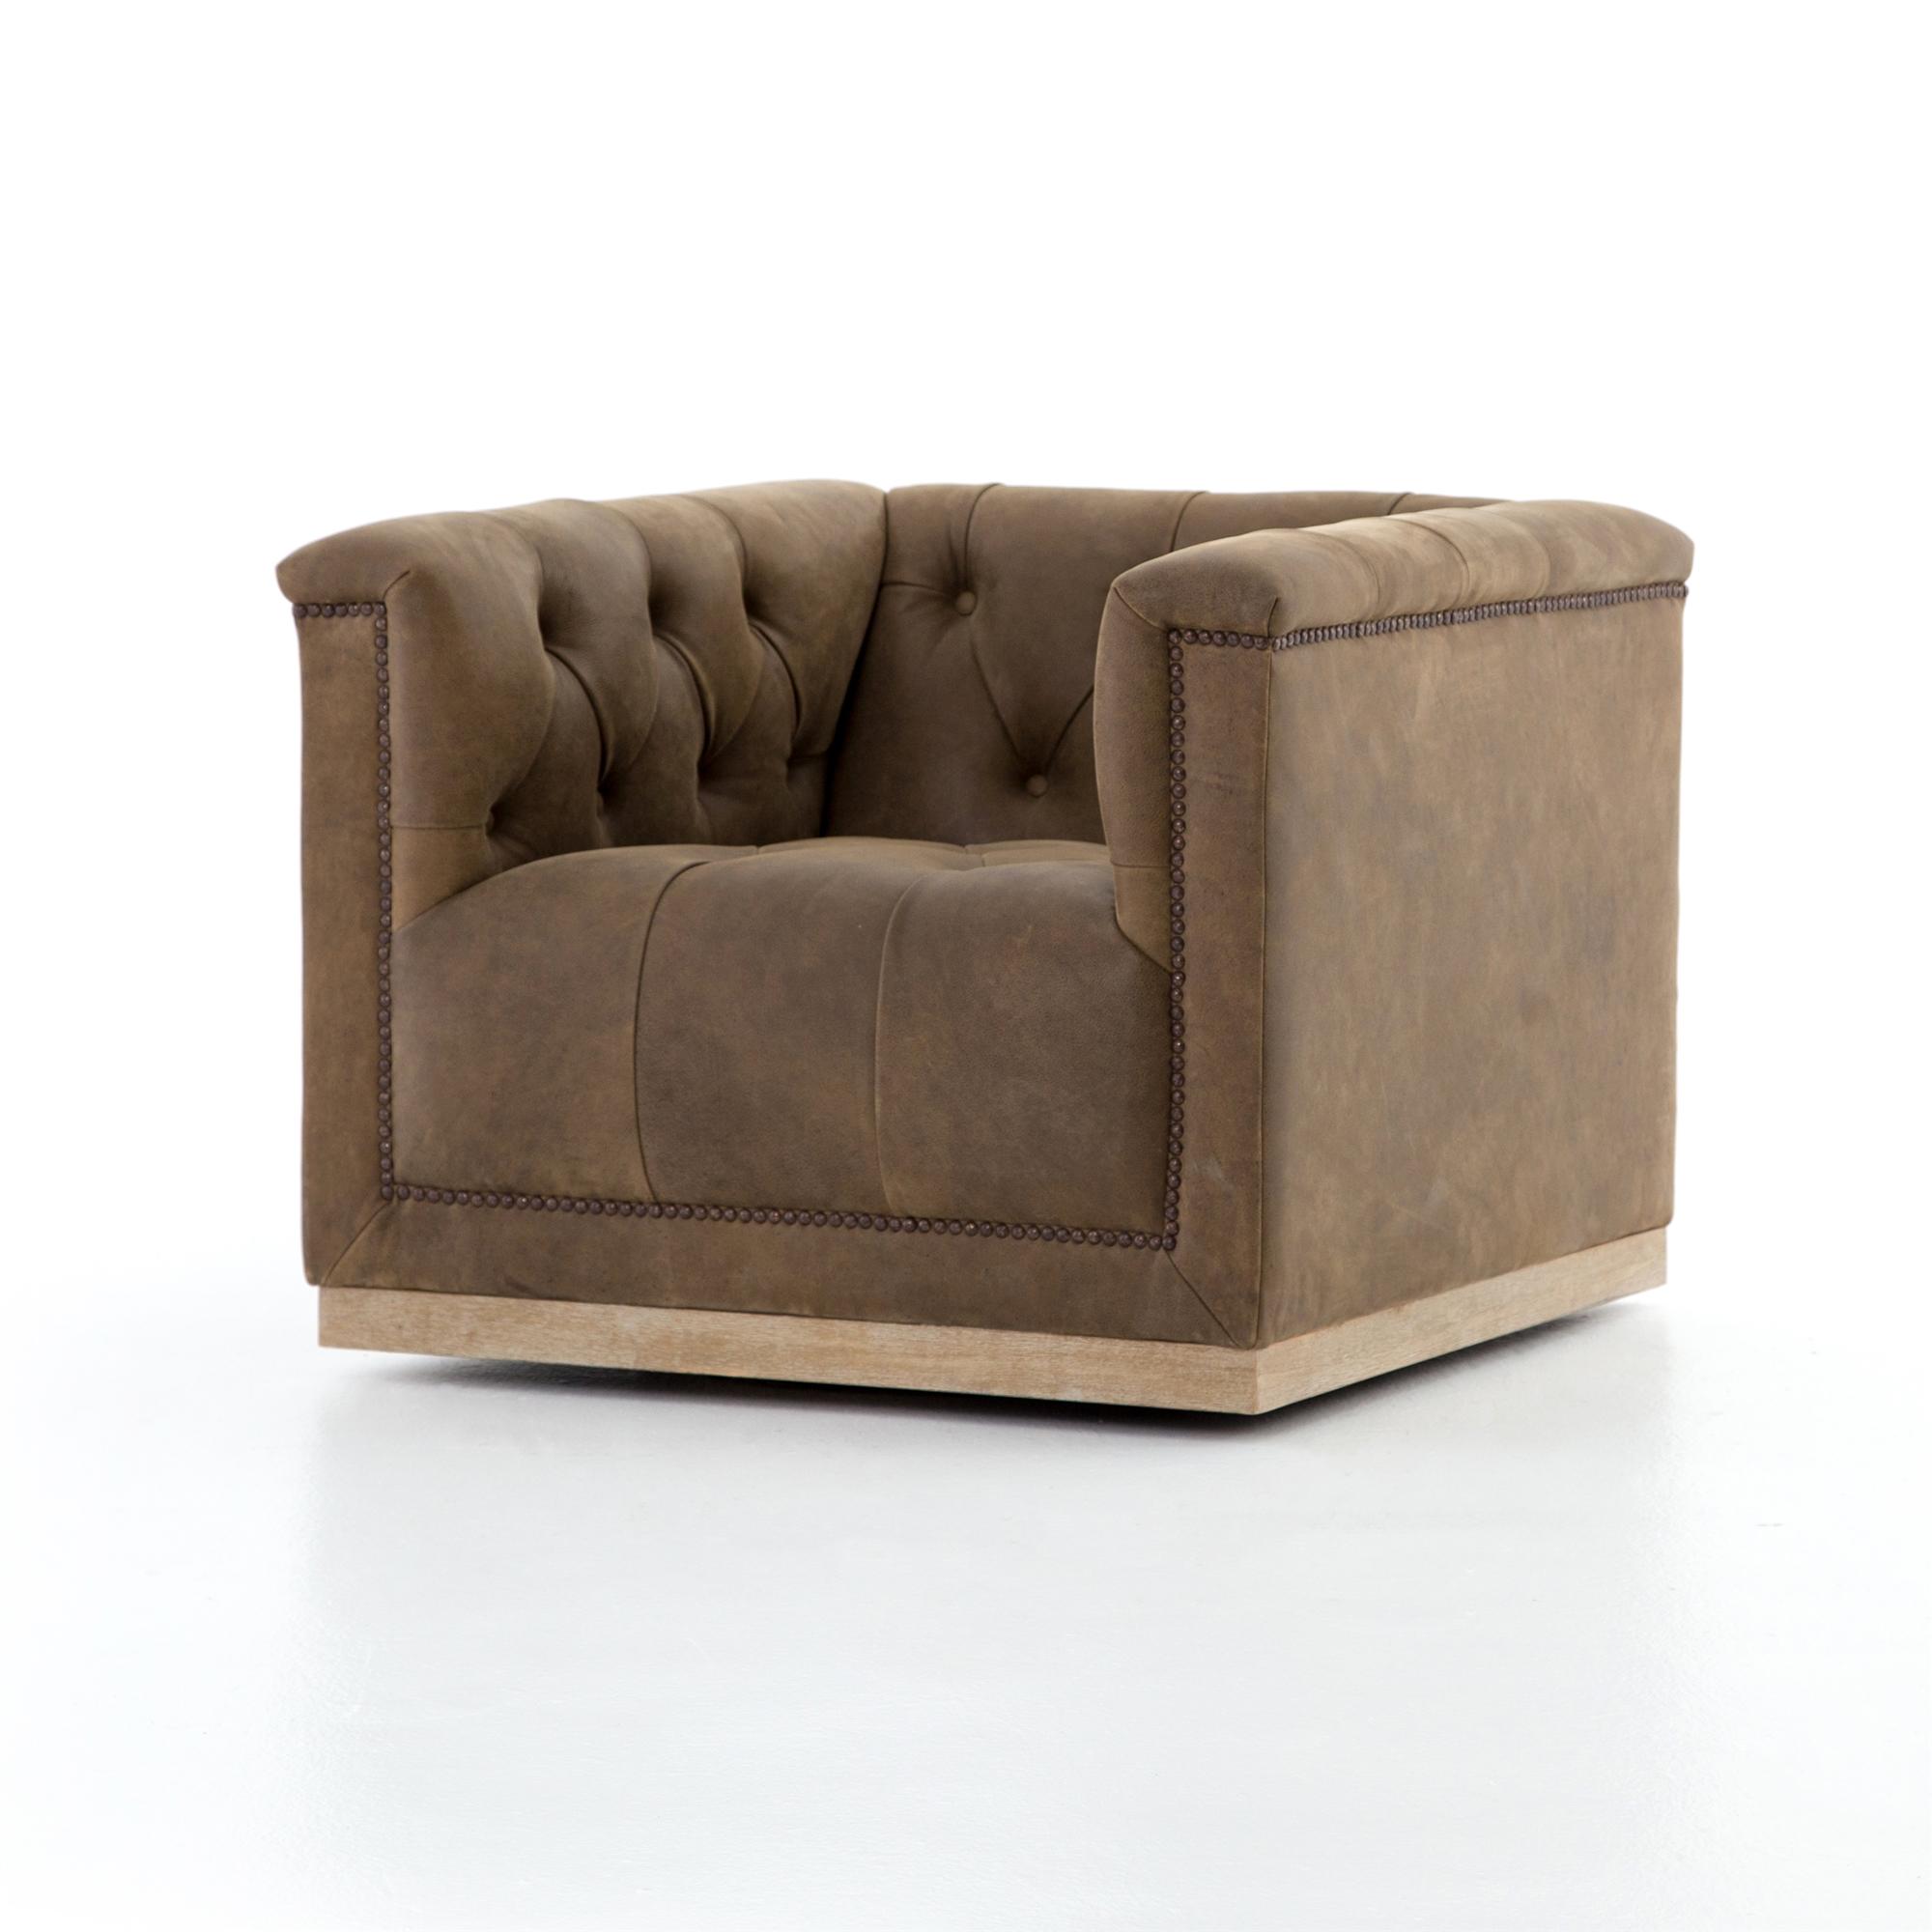 Maxx Swivel Chair-The Khazana Home Austin Furniture Store